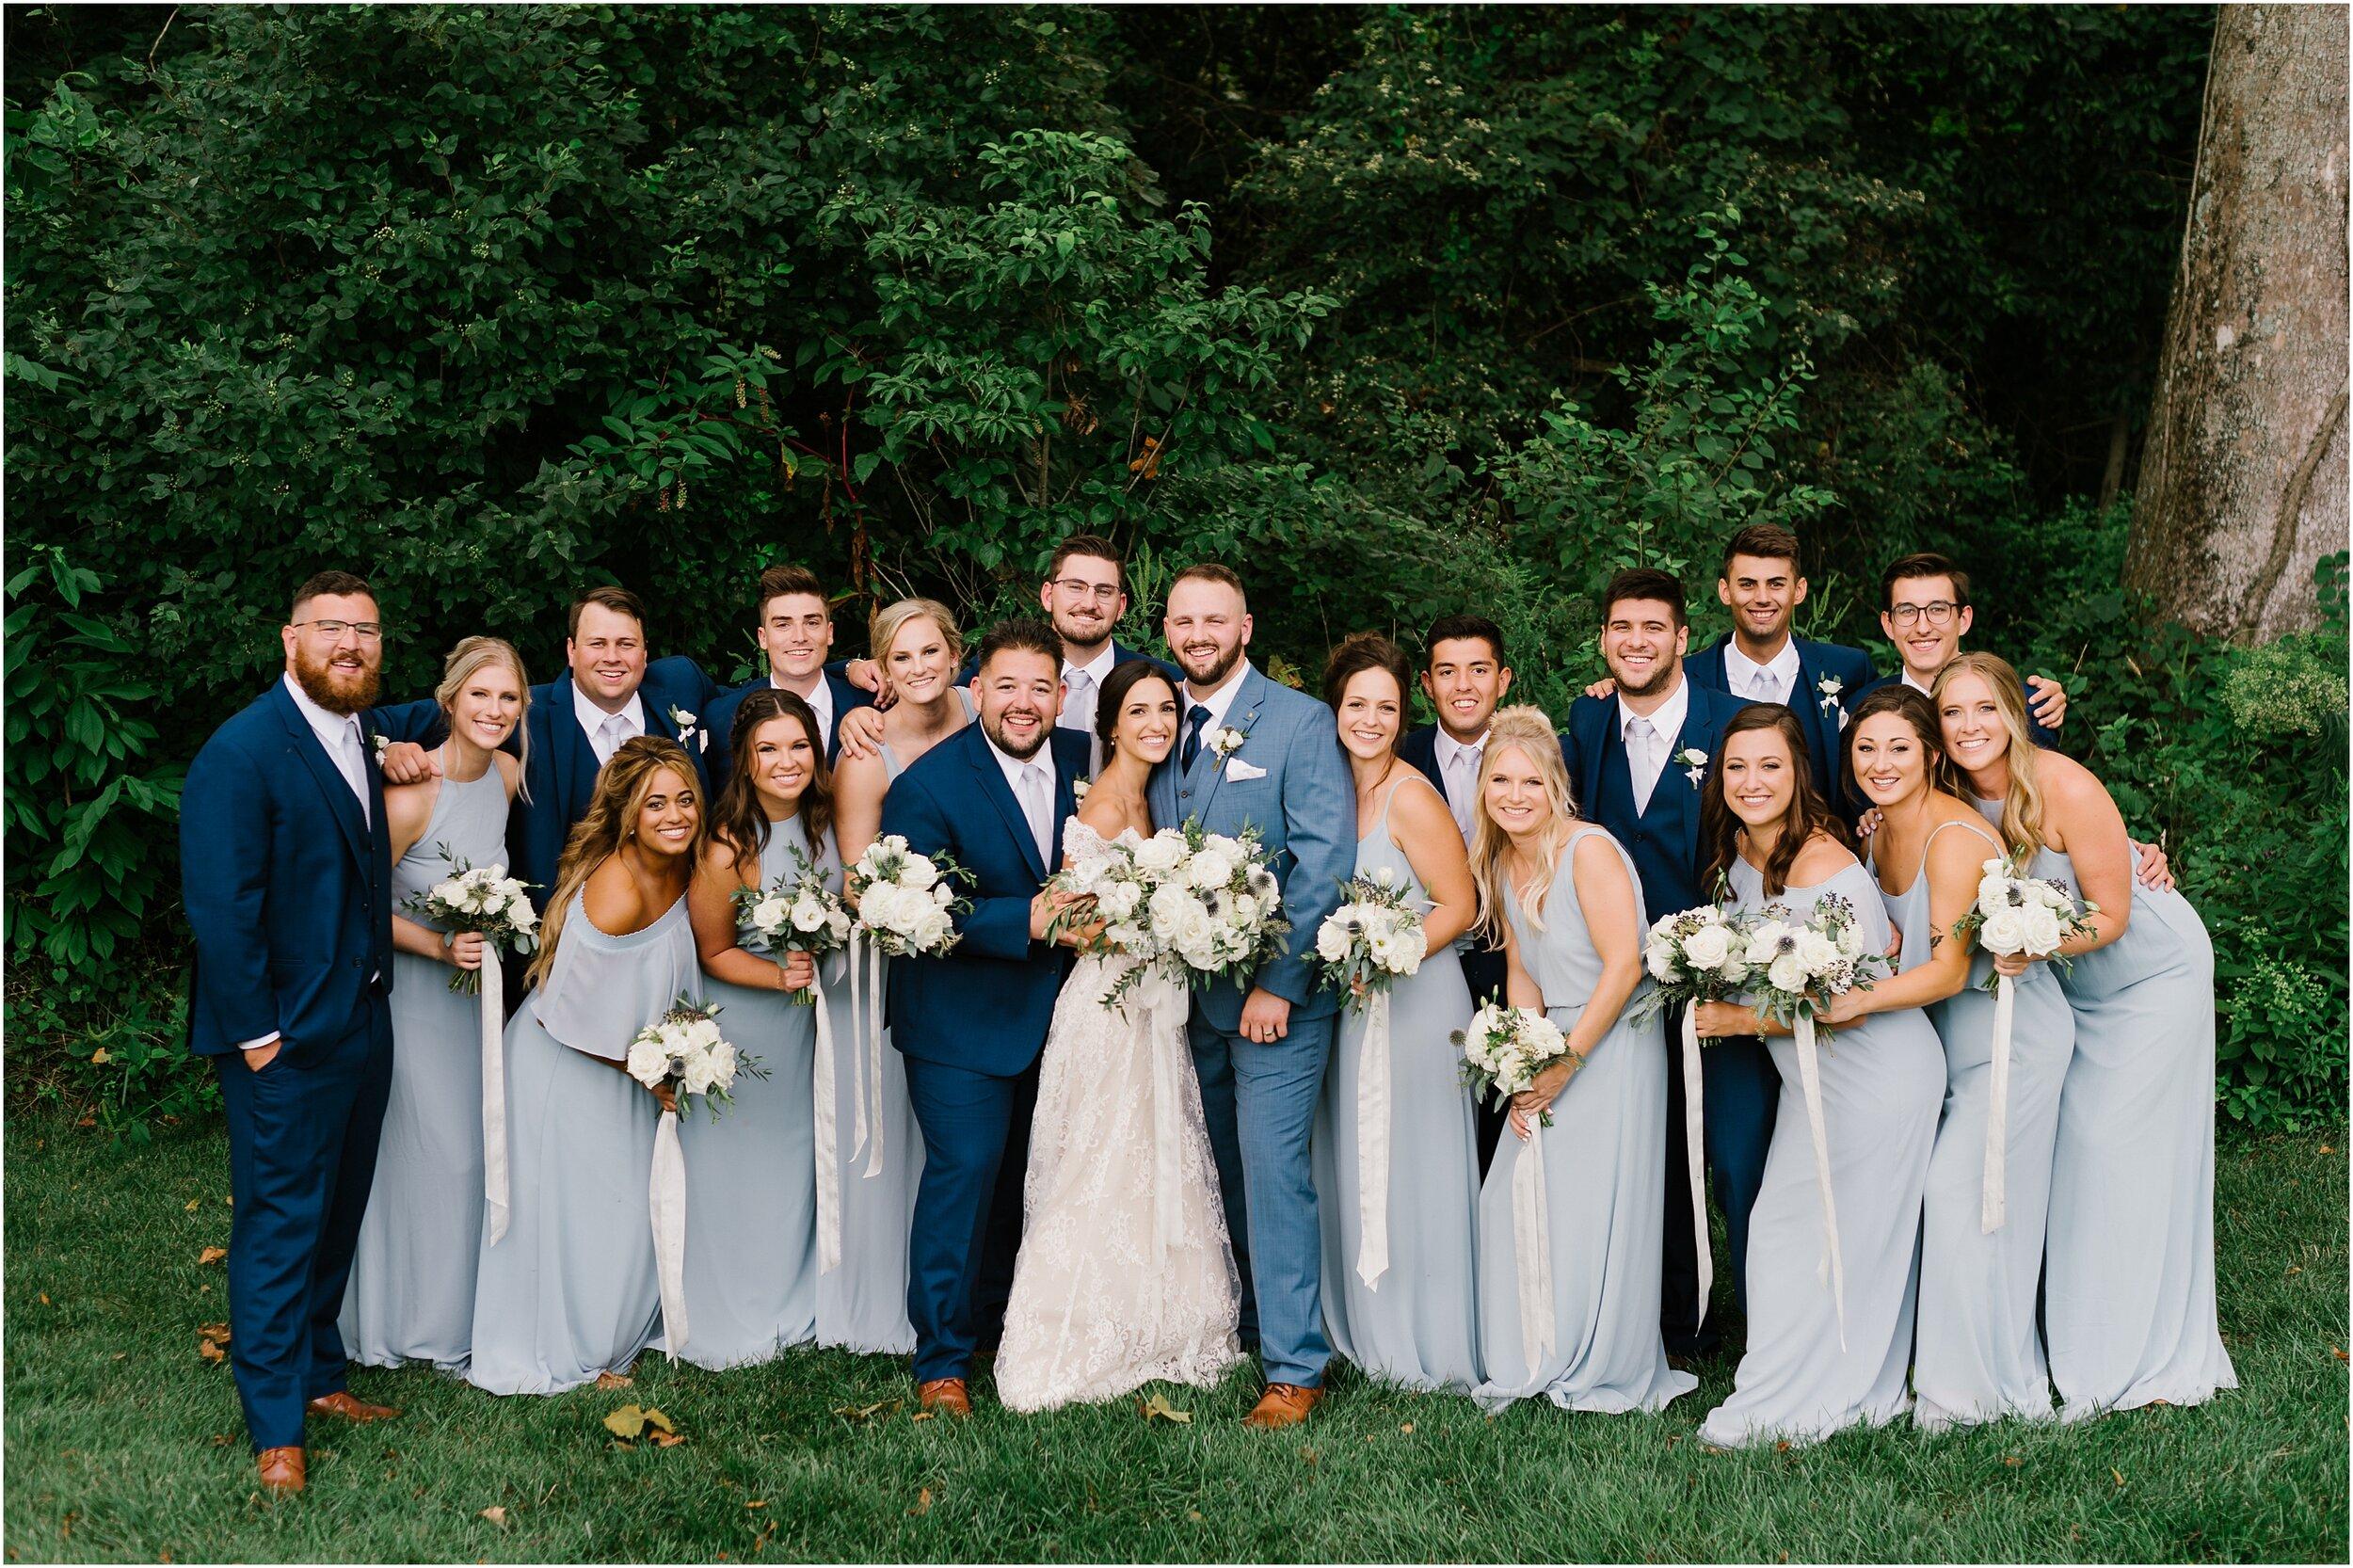 Rebecca Shehorn Photography Indianapolis Wedding Photographer Sycamore at Mallow Run_0749.jpg